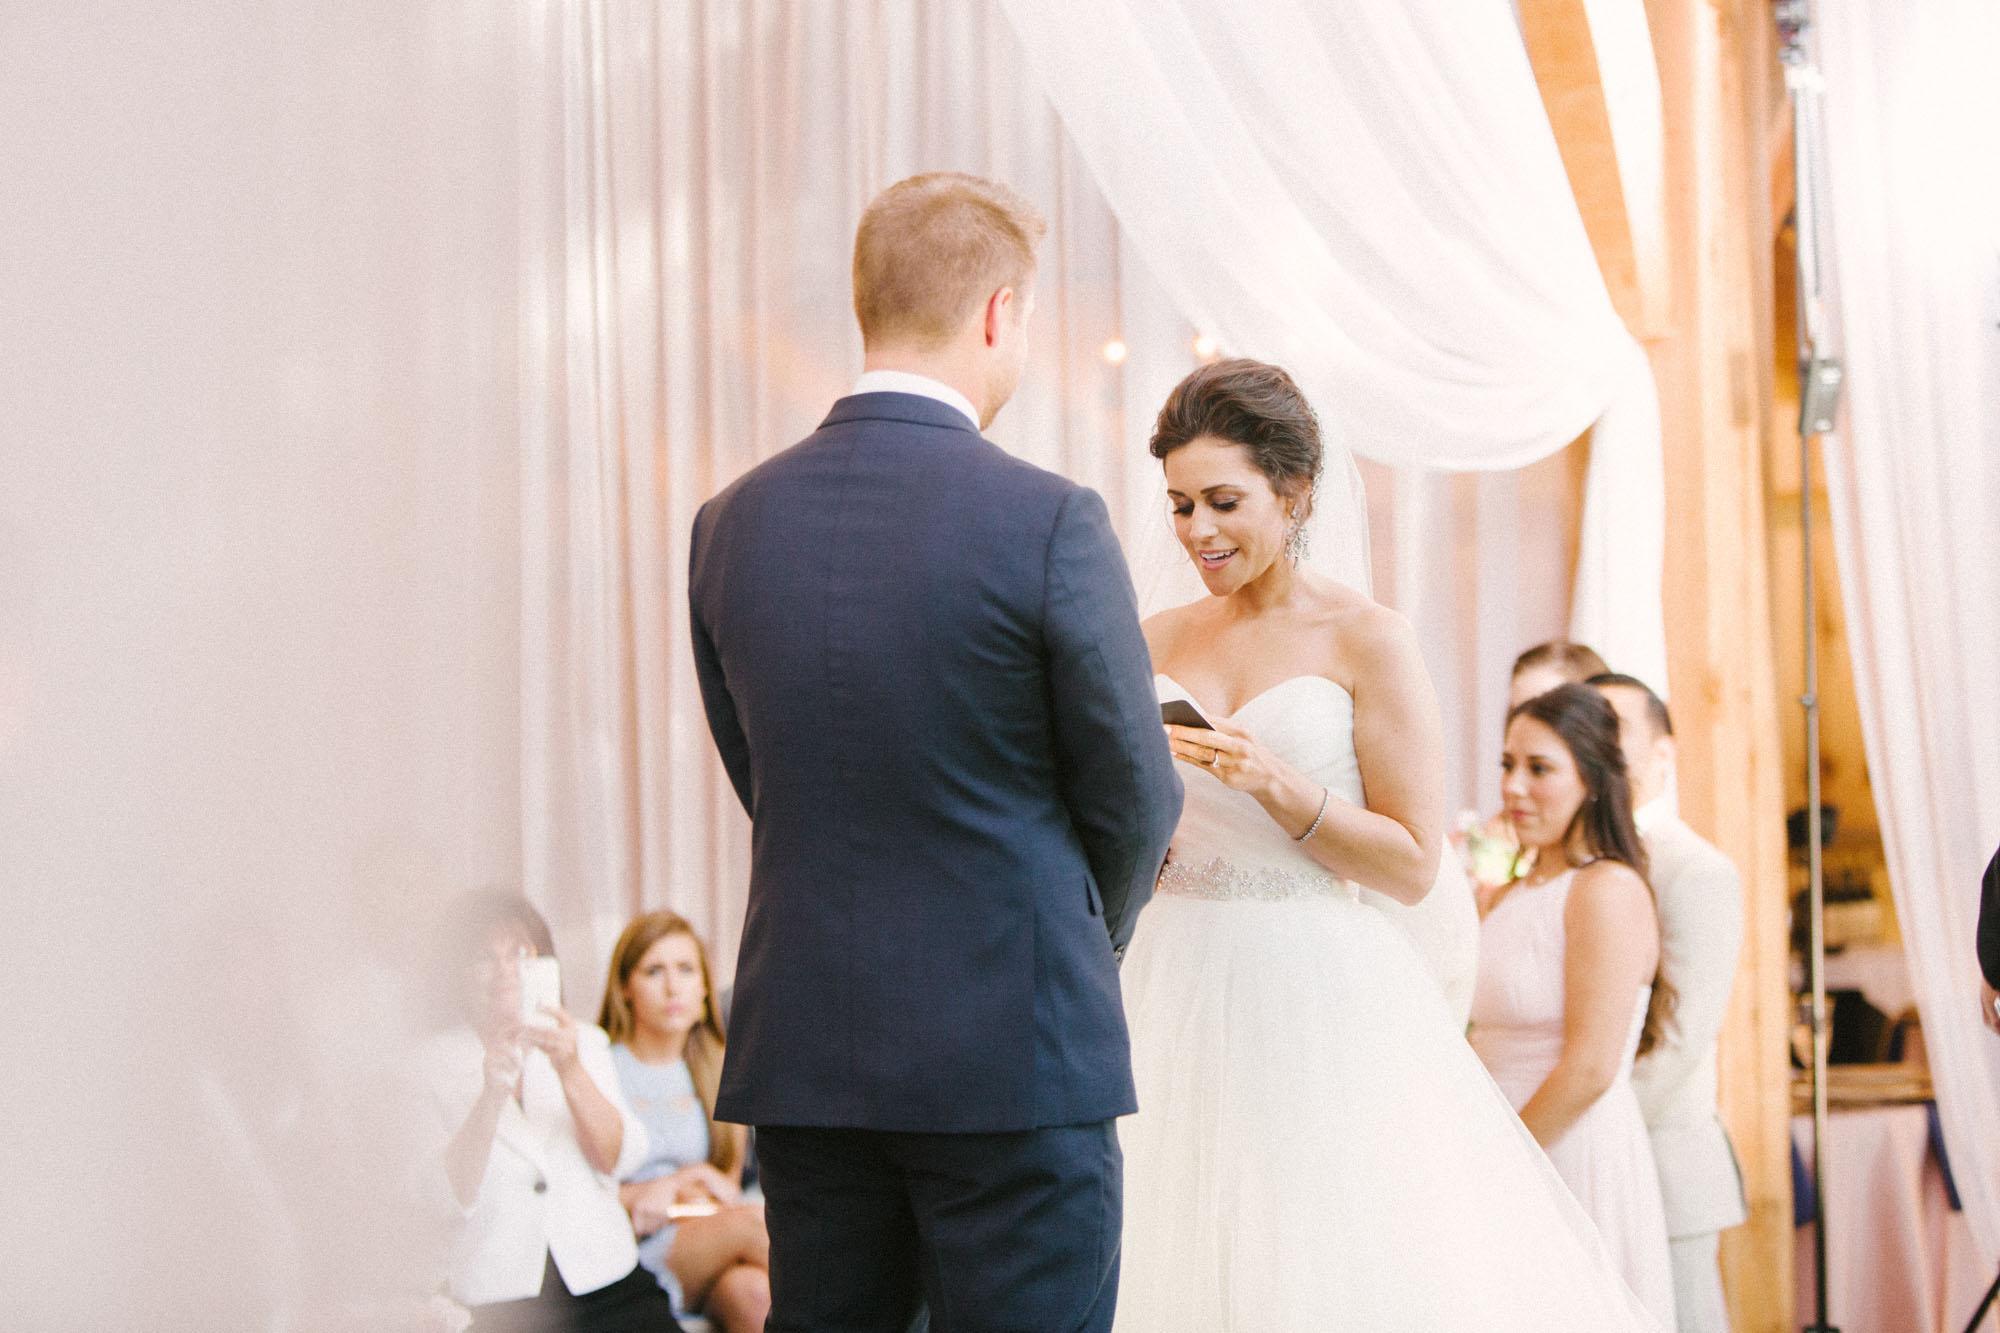 SM anna smith photography wedding photographer venue wedding planner-480.jpg